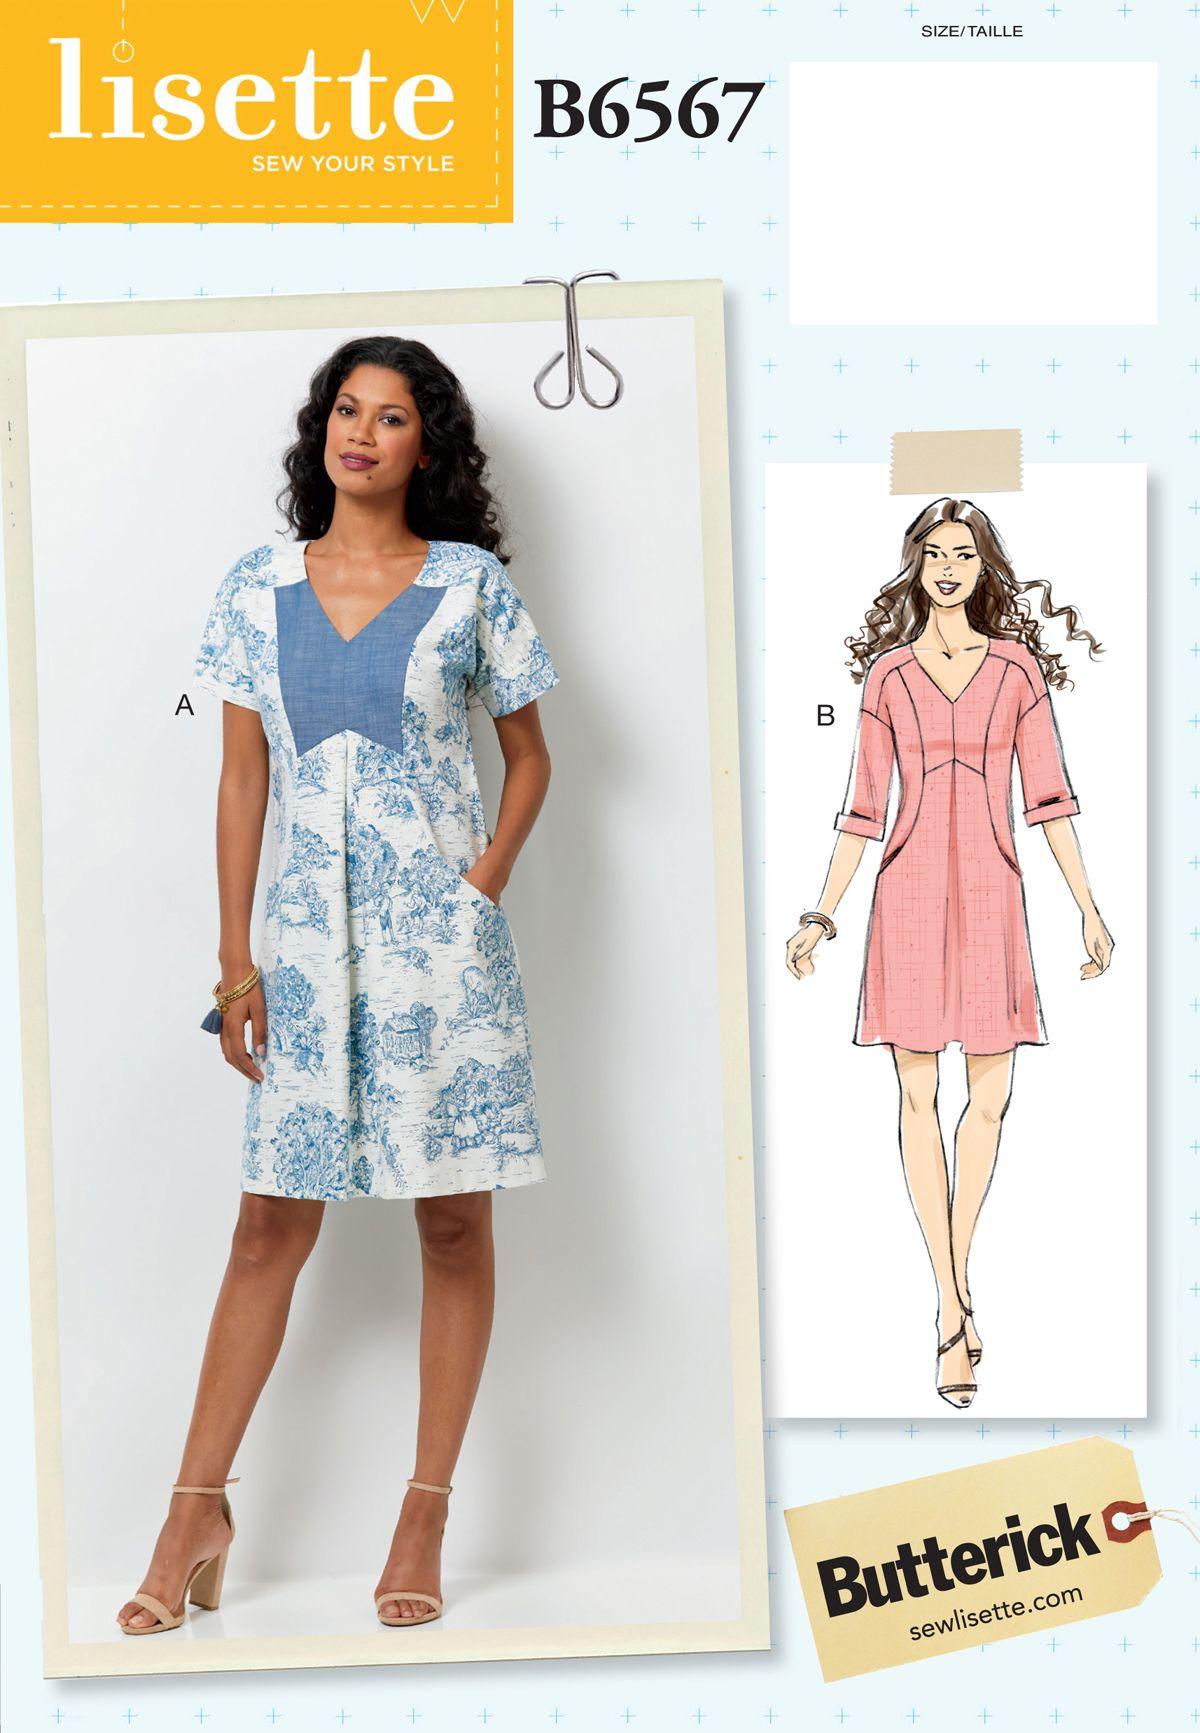 introducing lisette for butterick B6567 | Sew Inspiring | Pinterest